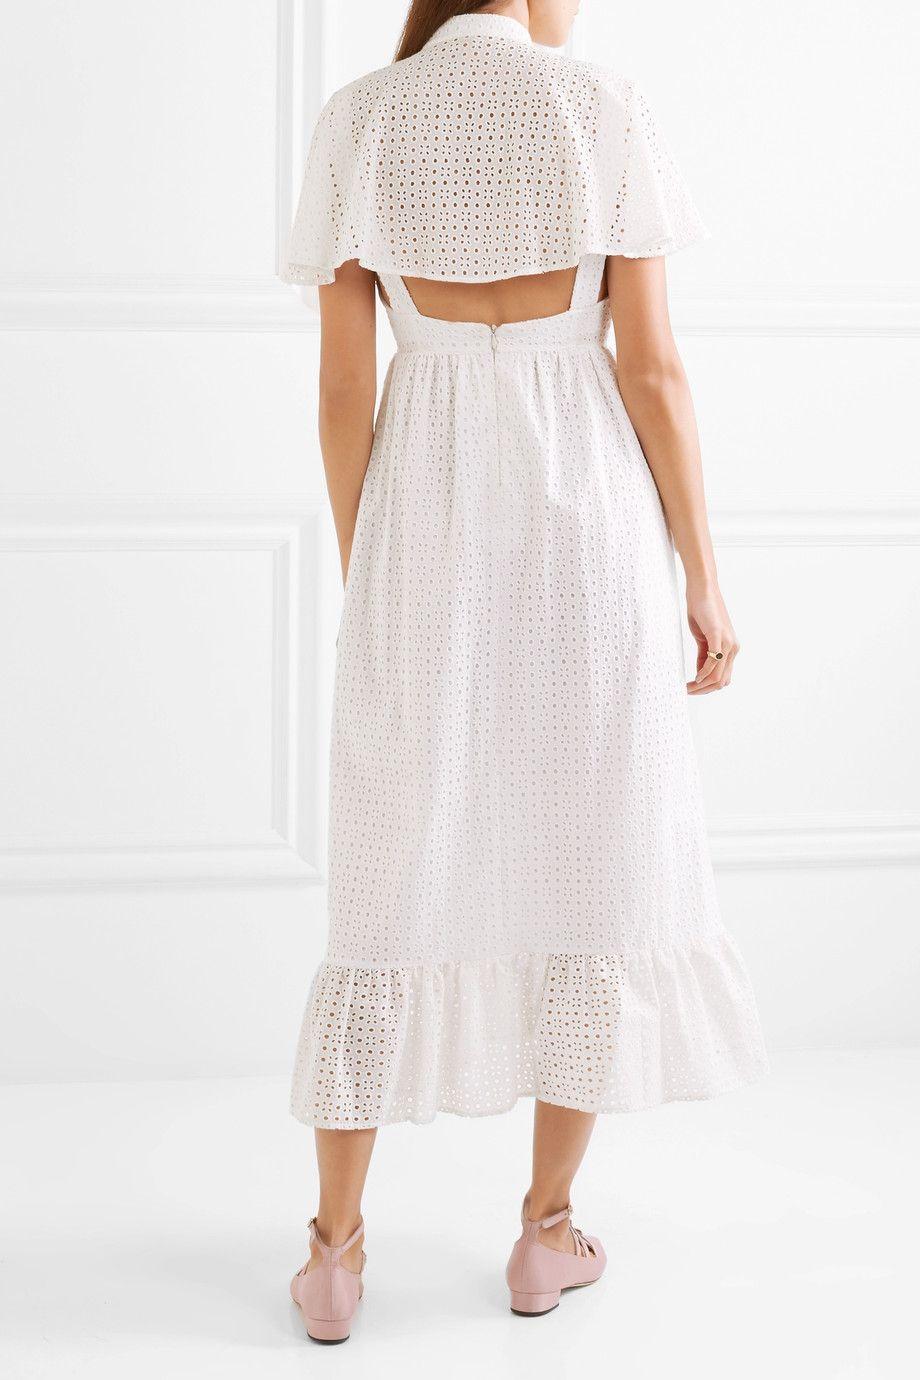 Alexachung capeback broderie anglaise cotton midi dress neta